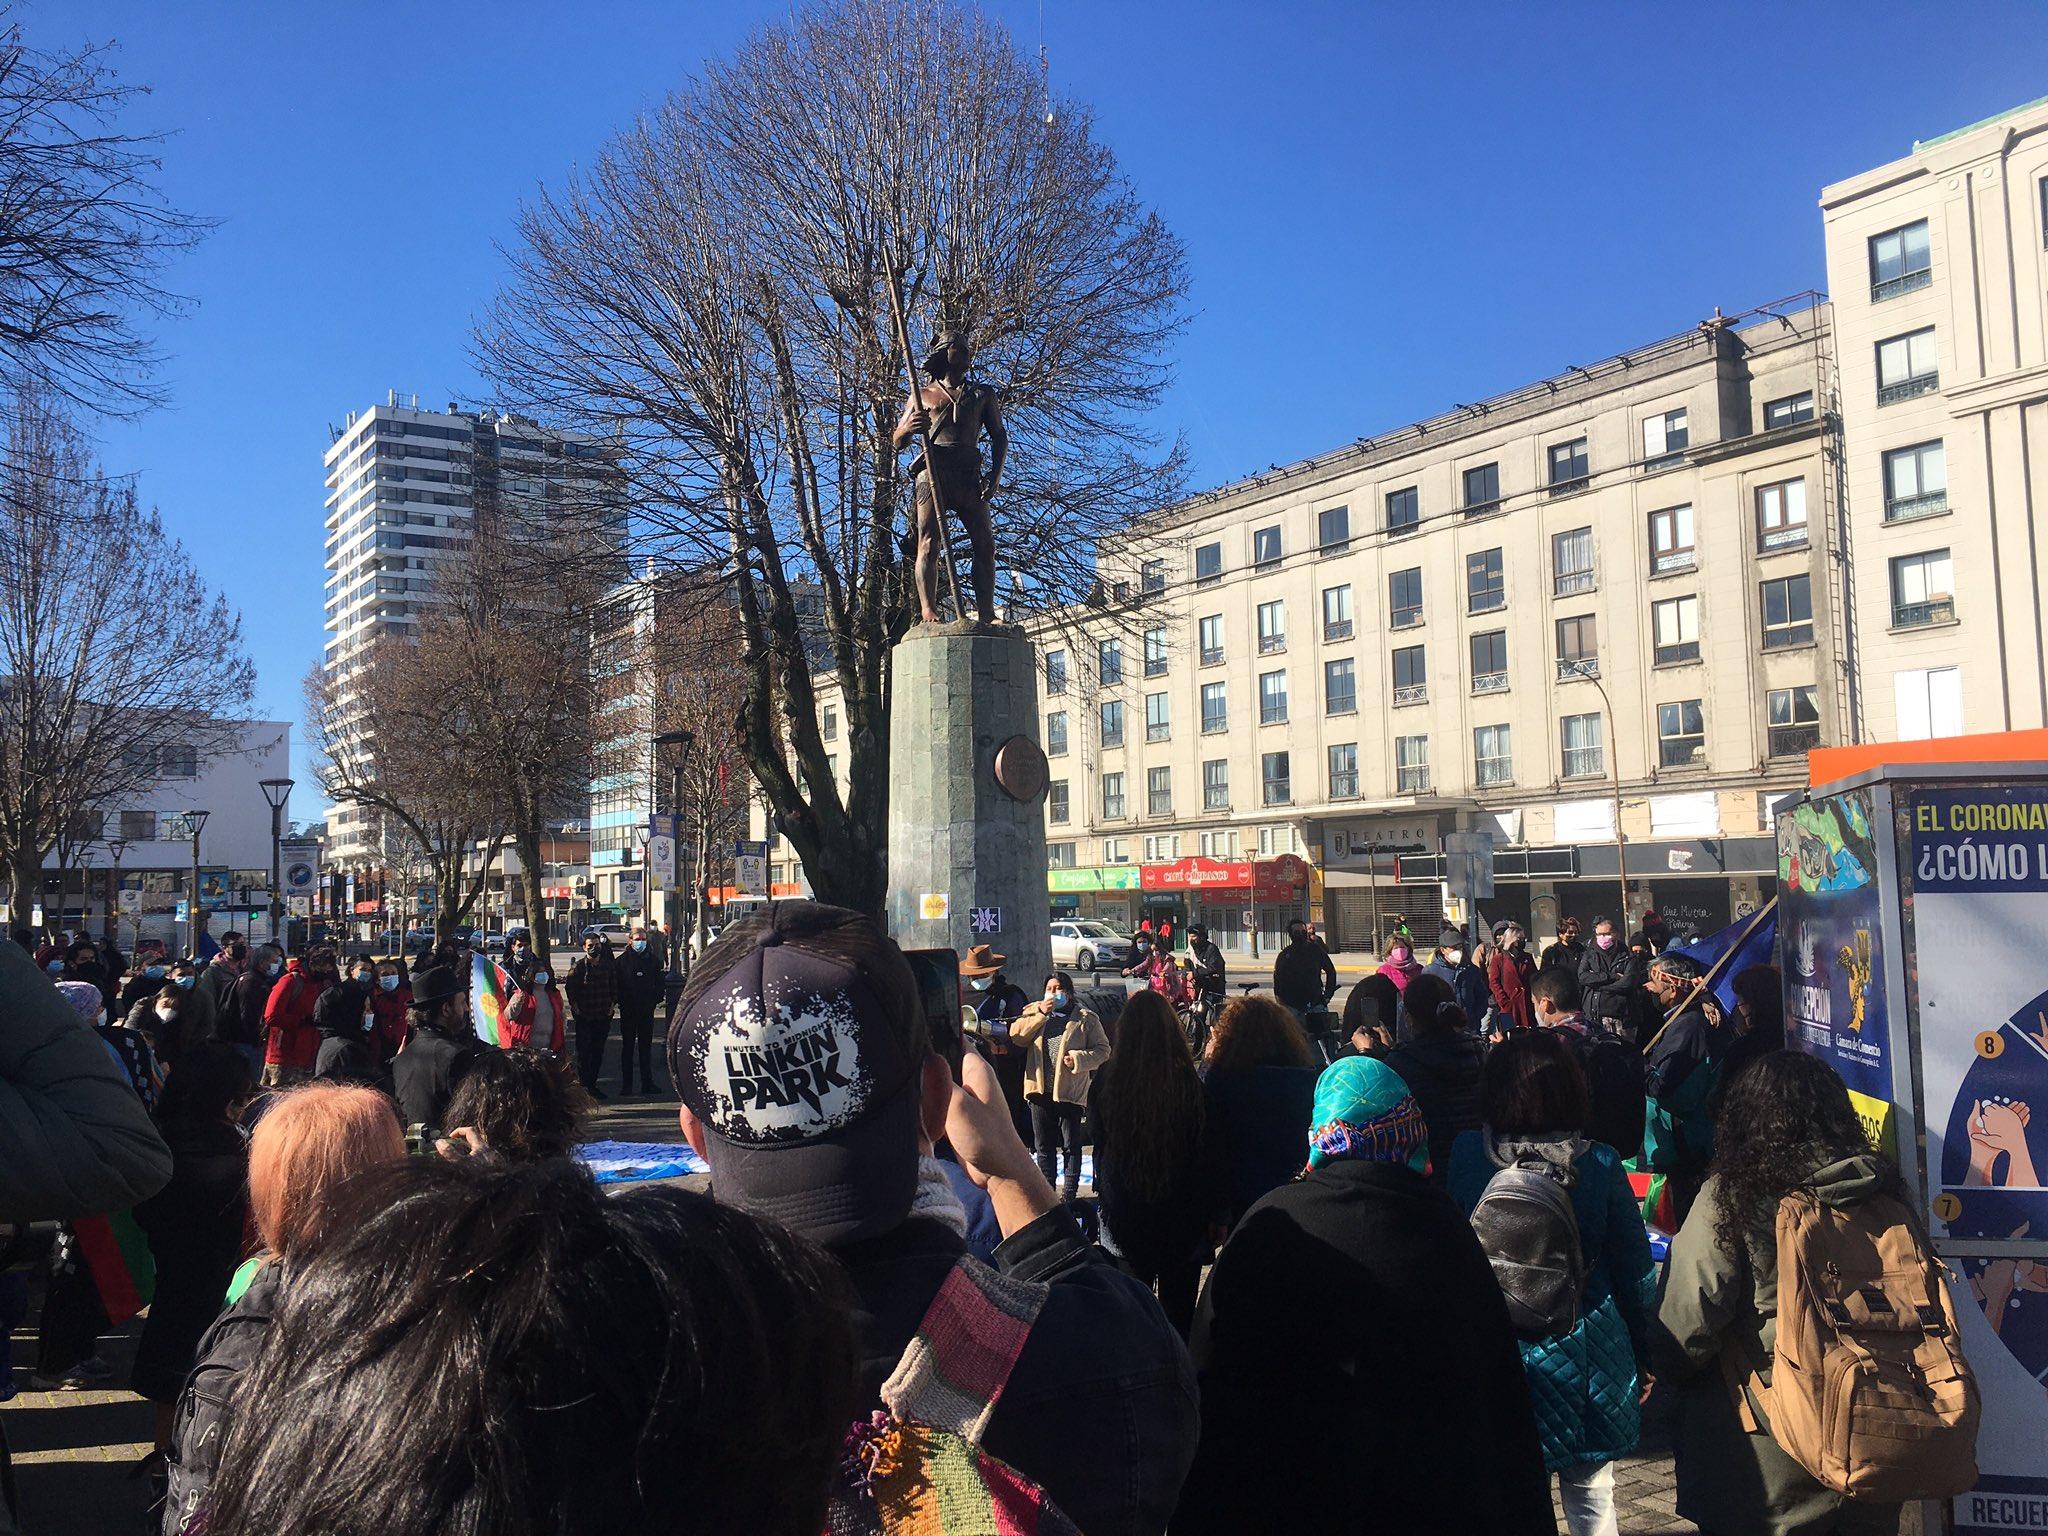 Convocan a manifestación en cerro Huelén en Santiago tras asesinato de weichafe Pablo Marchant